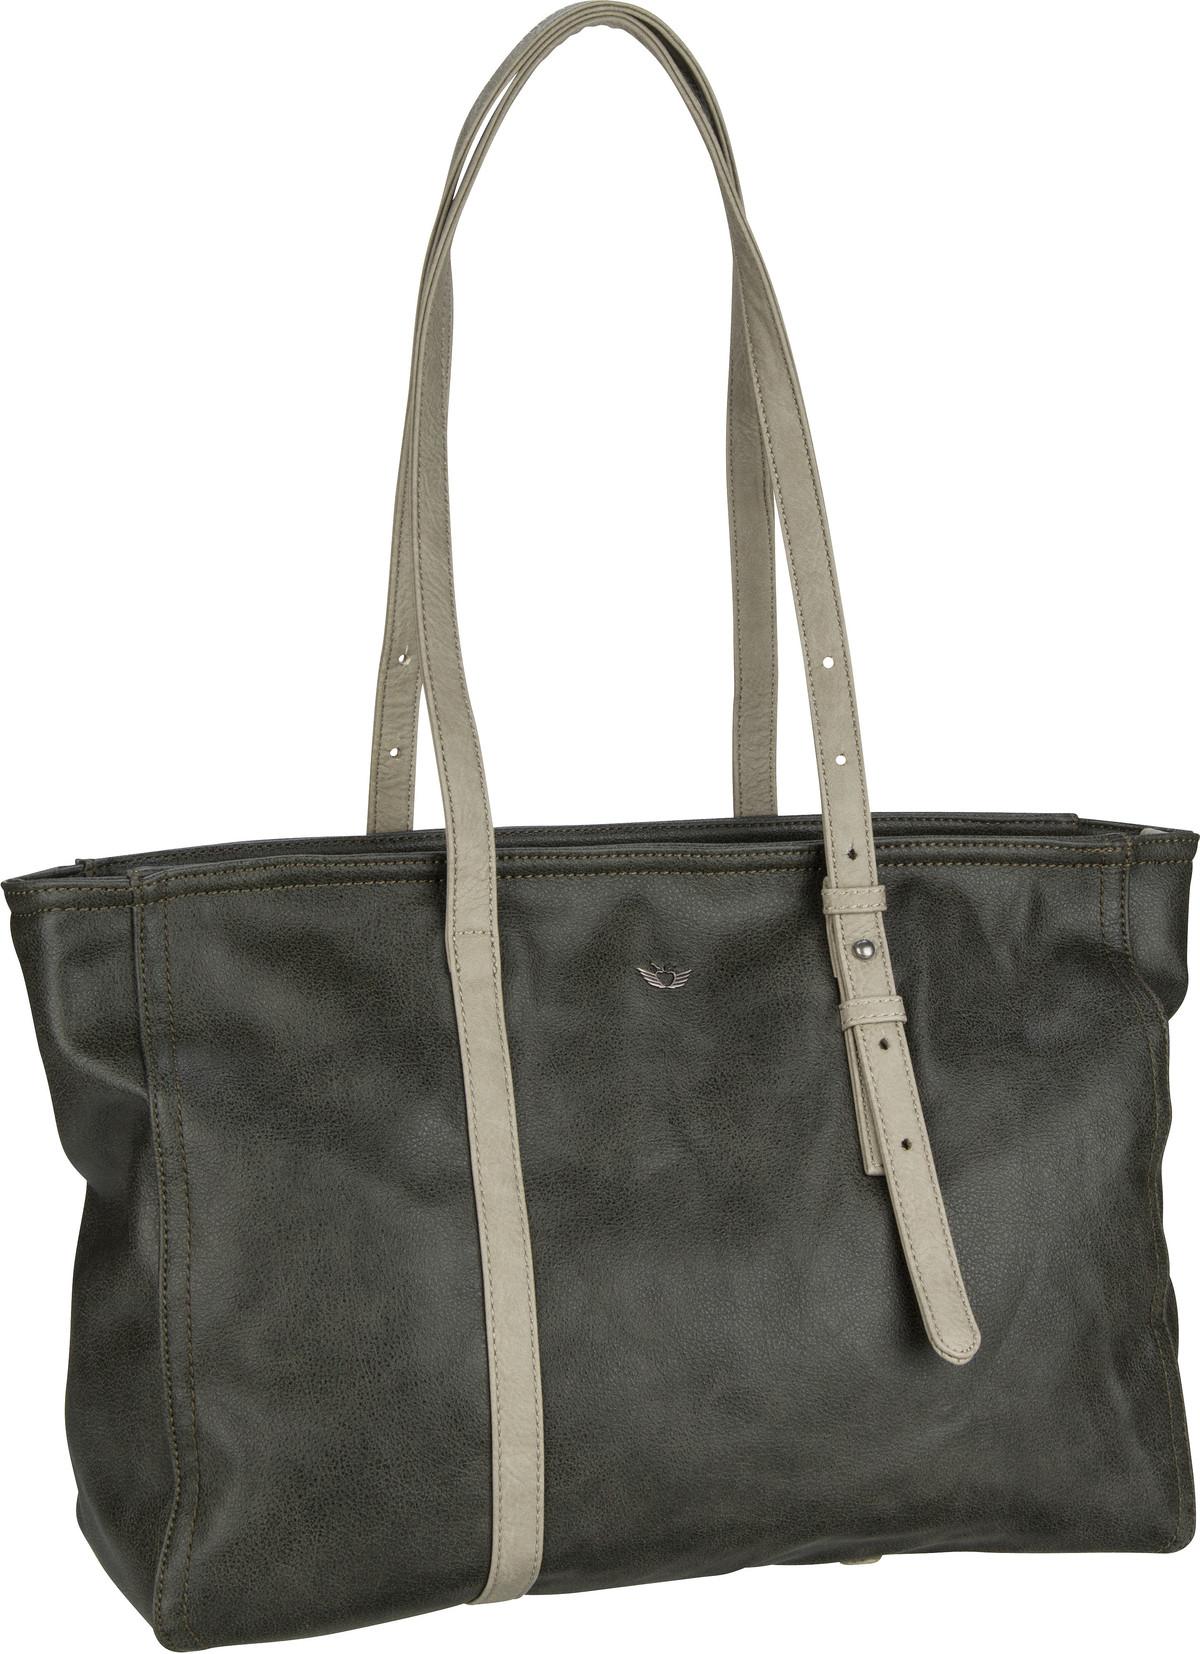 Handtasche Iska Orion Cool Khaki